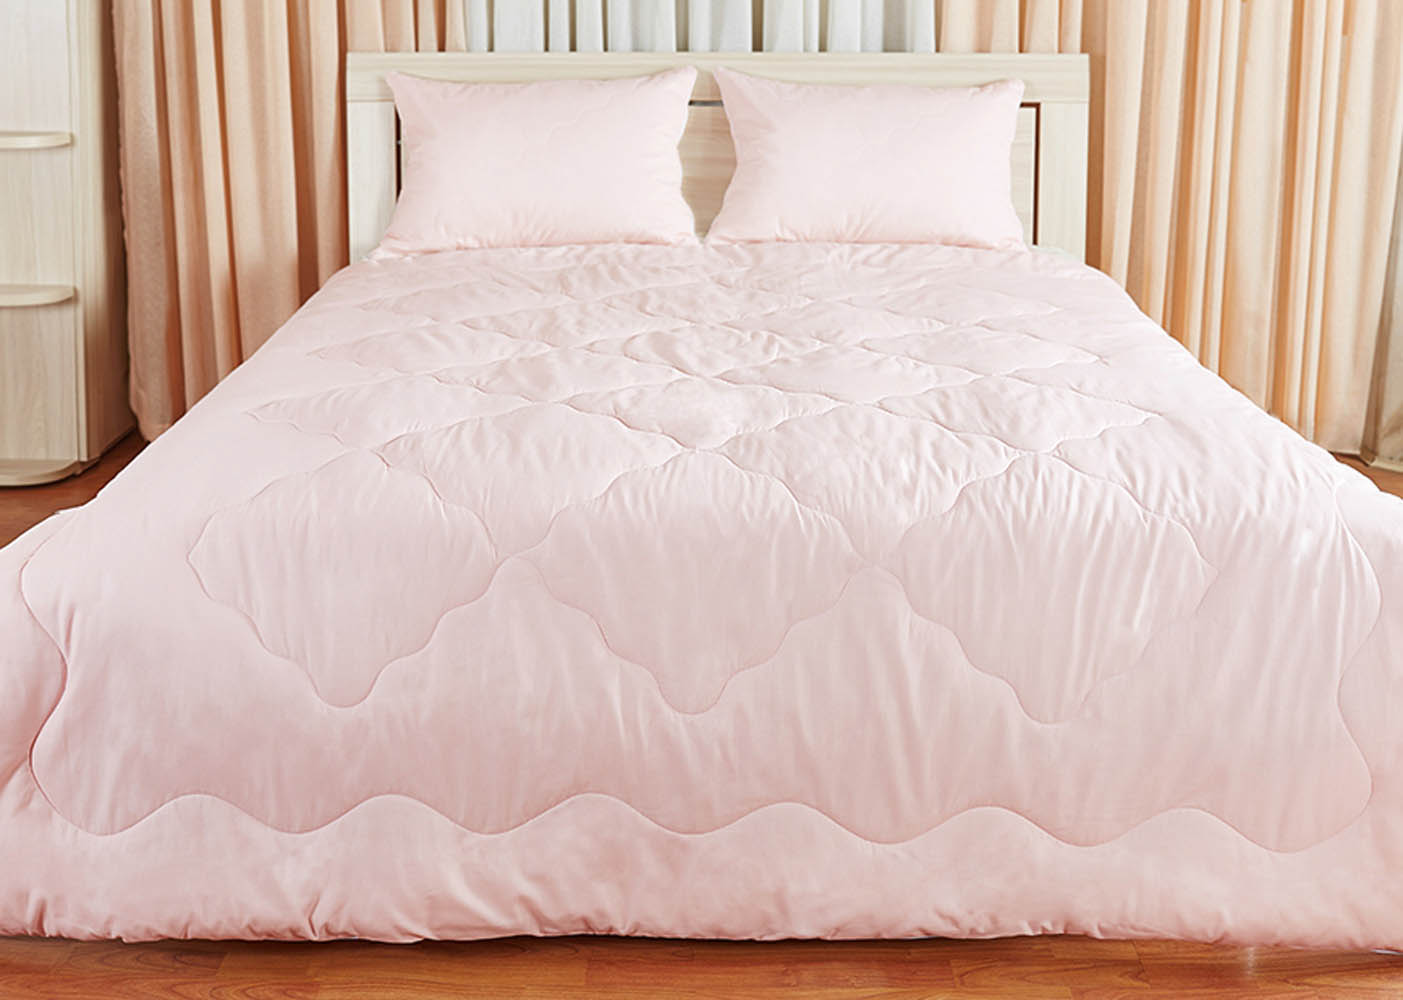 Одеяла Primavelle Одеяло Lavander Цвет: Розовый (200х220 см) лак для ногтей beautydrugs scented nail polish lavander цвет lavander variant hex name 9378ad